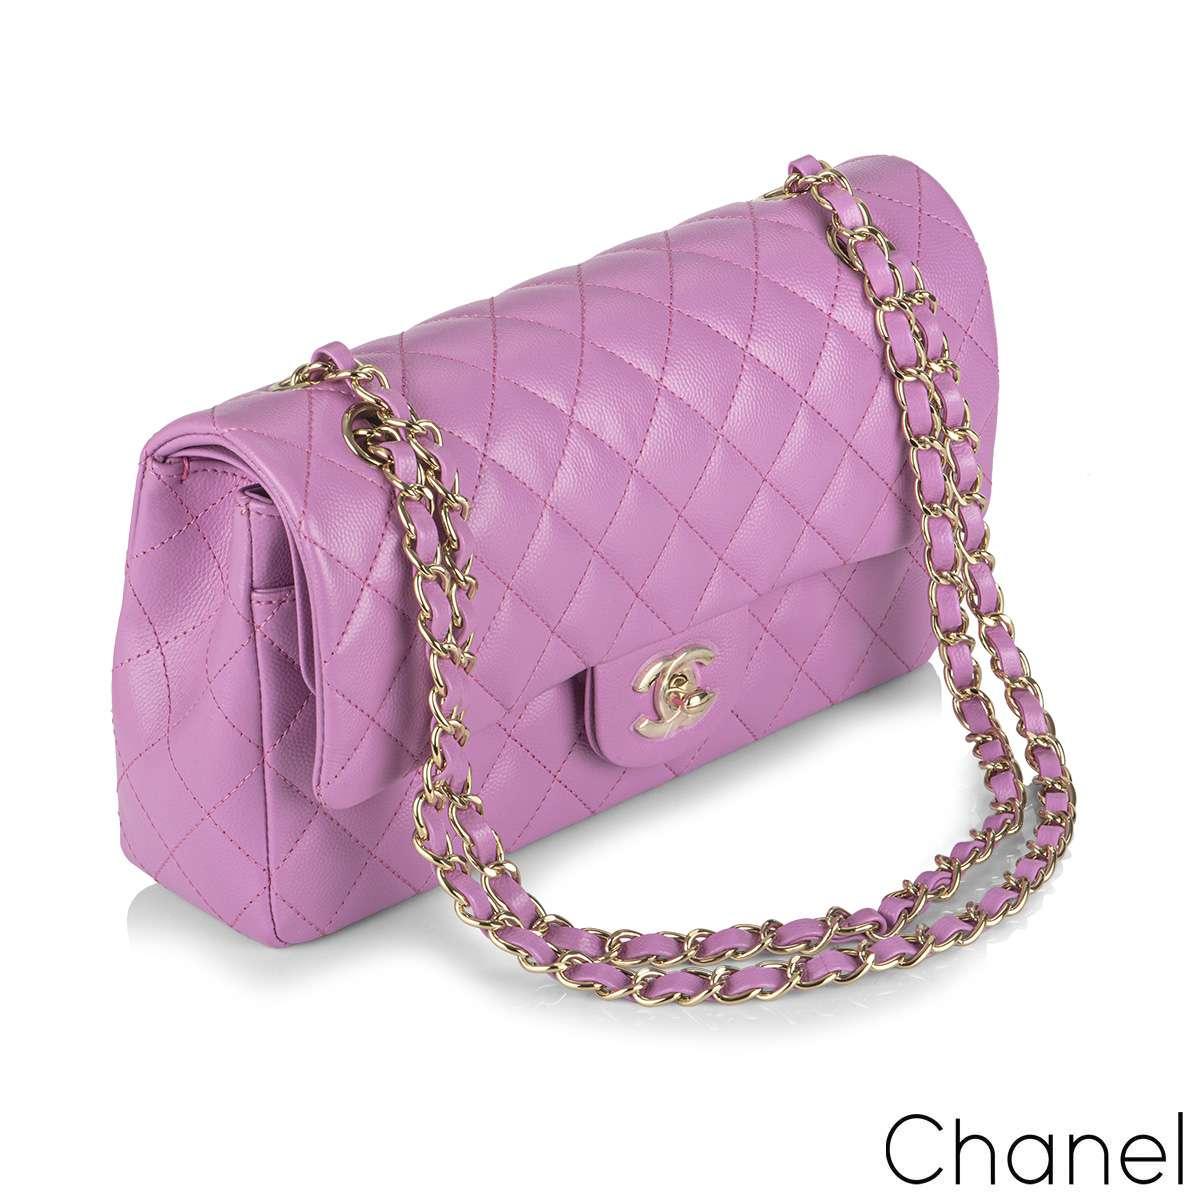 Chanel Lilac Caviar Medium Classic Double Flap Bag